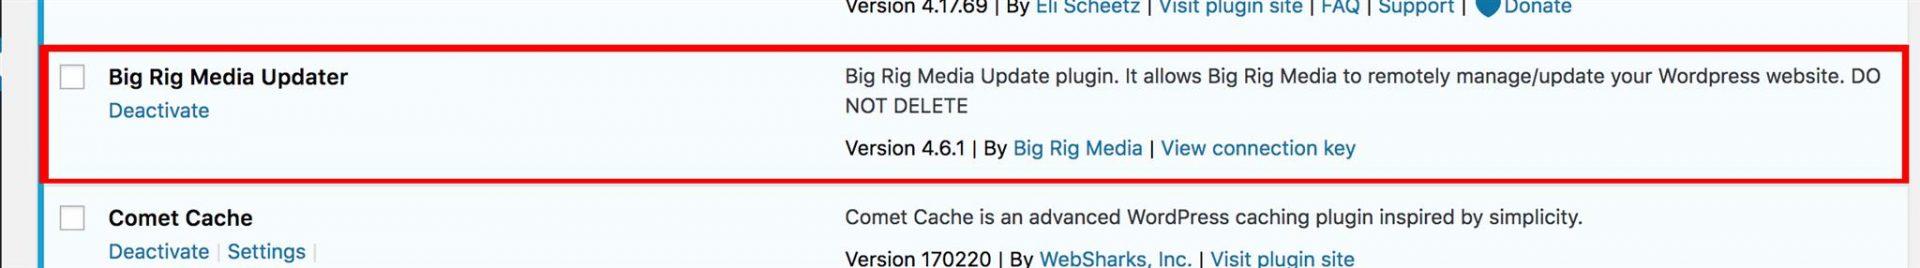 Big Rig Media Updater